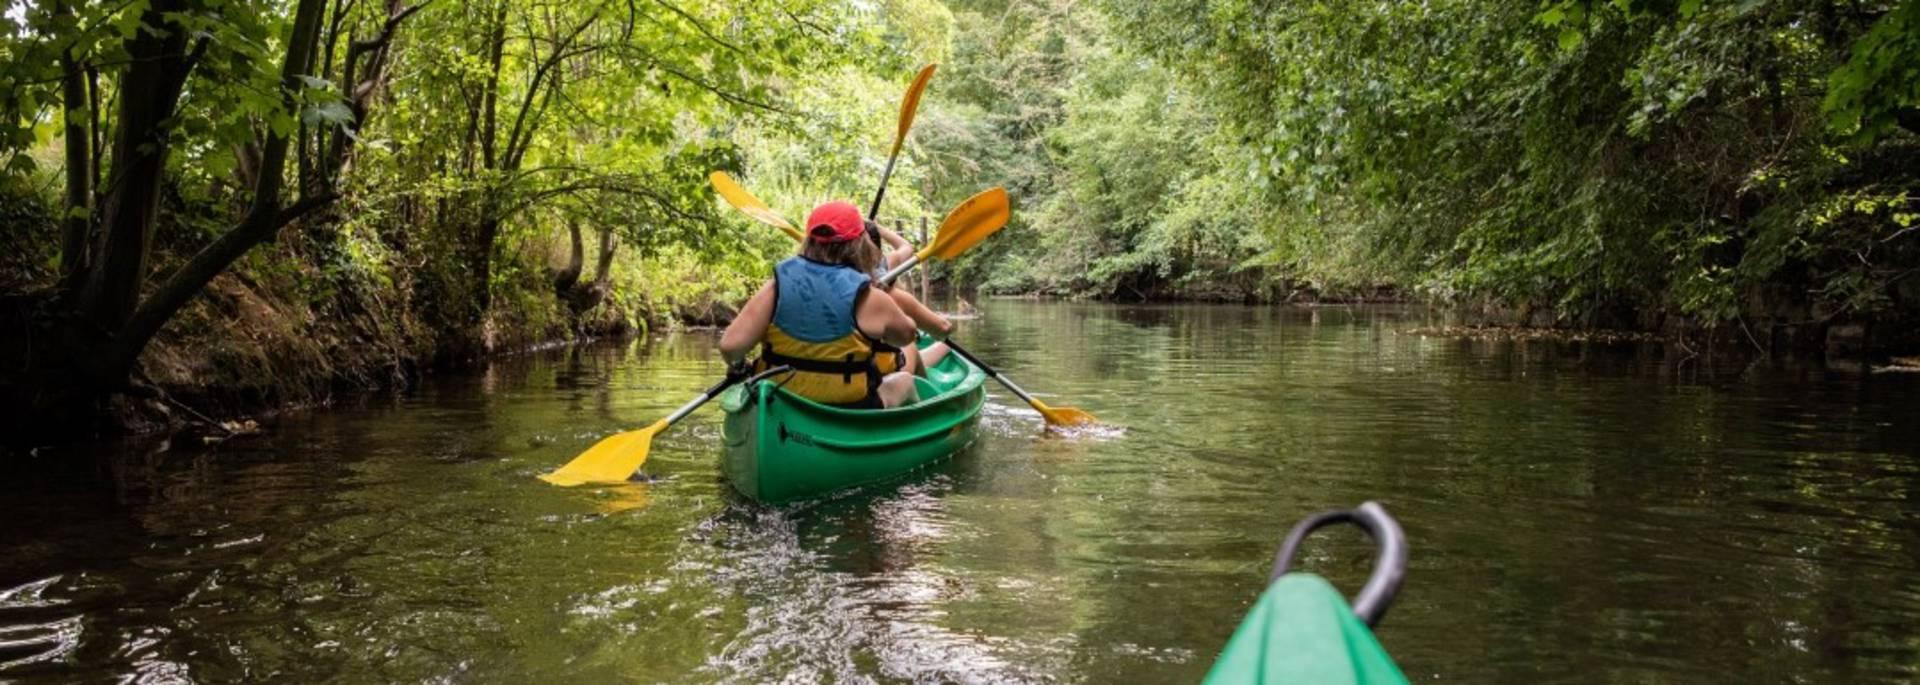 Balade en canoë kayak en Terres de Chartres